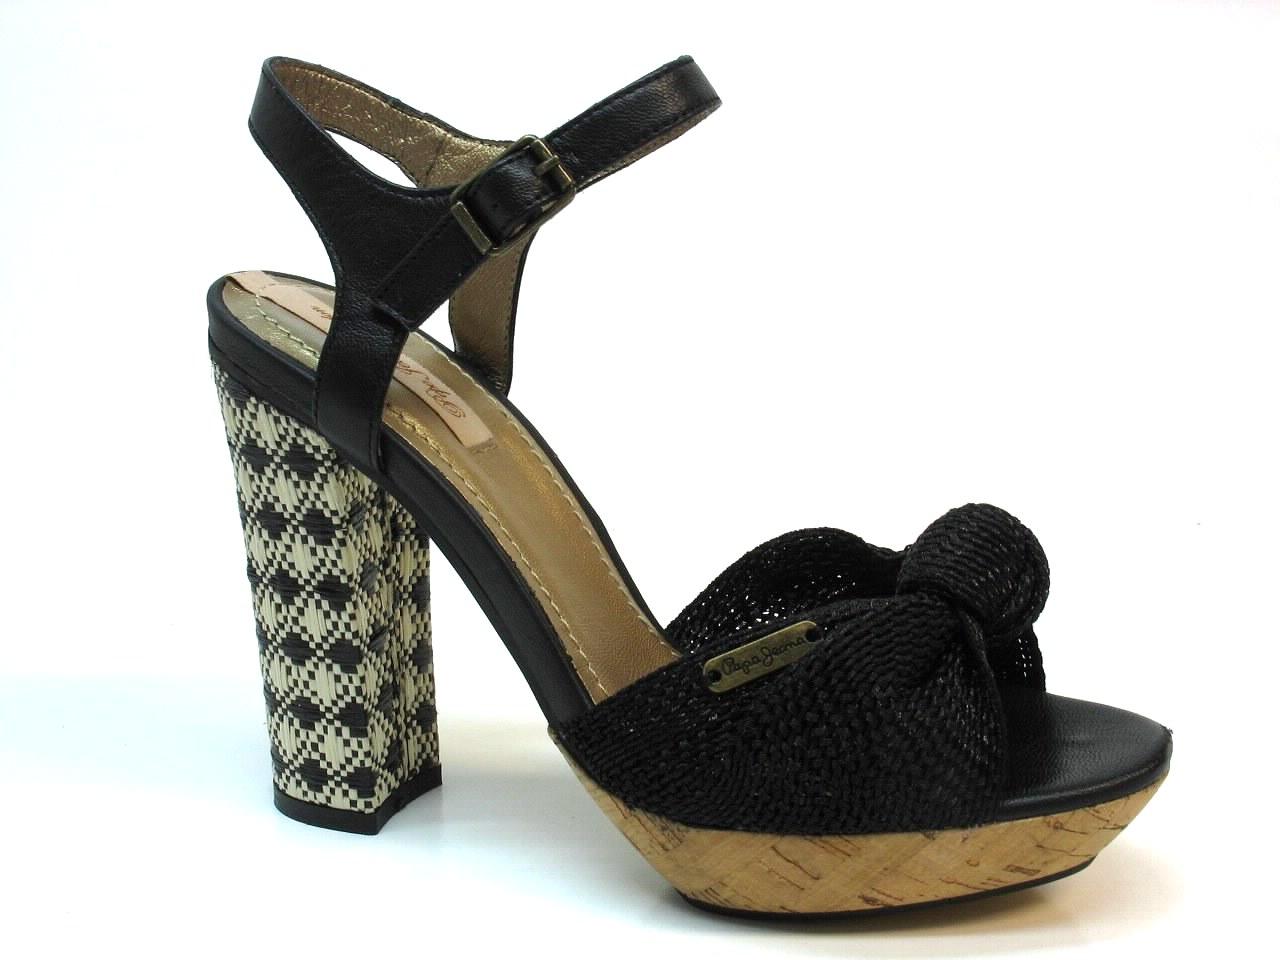 Sandálias de Salto Pepe Jeans - 608 STJ-272